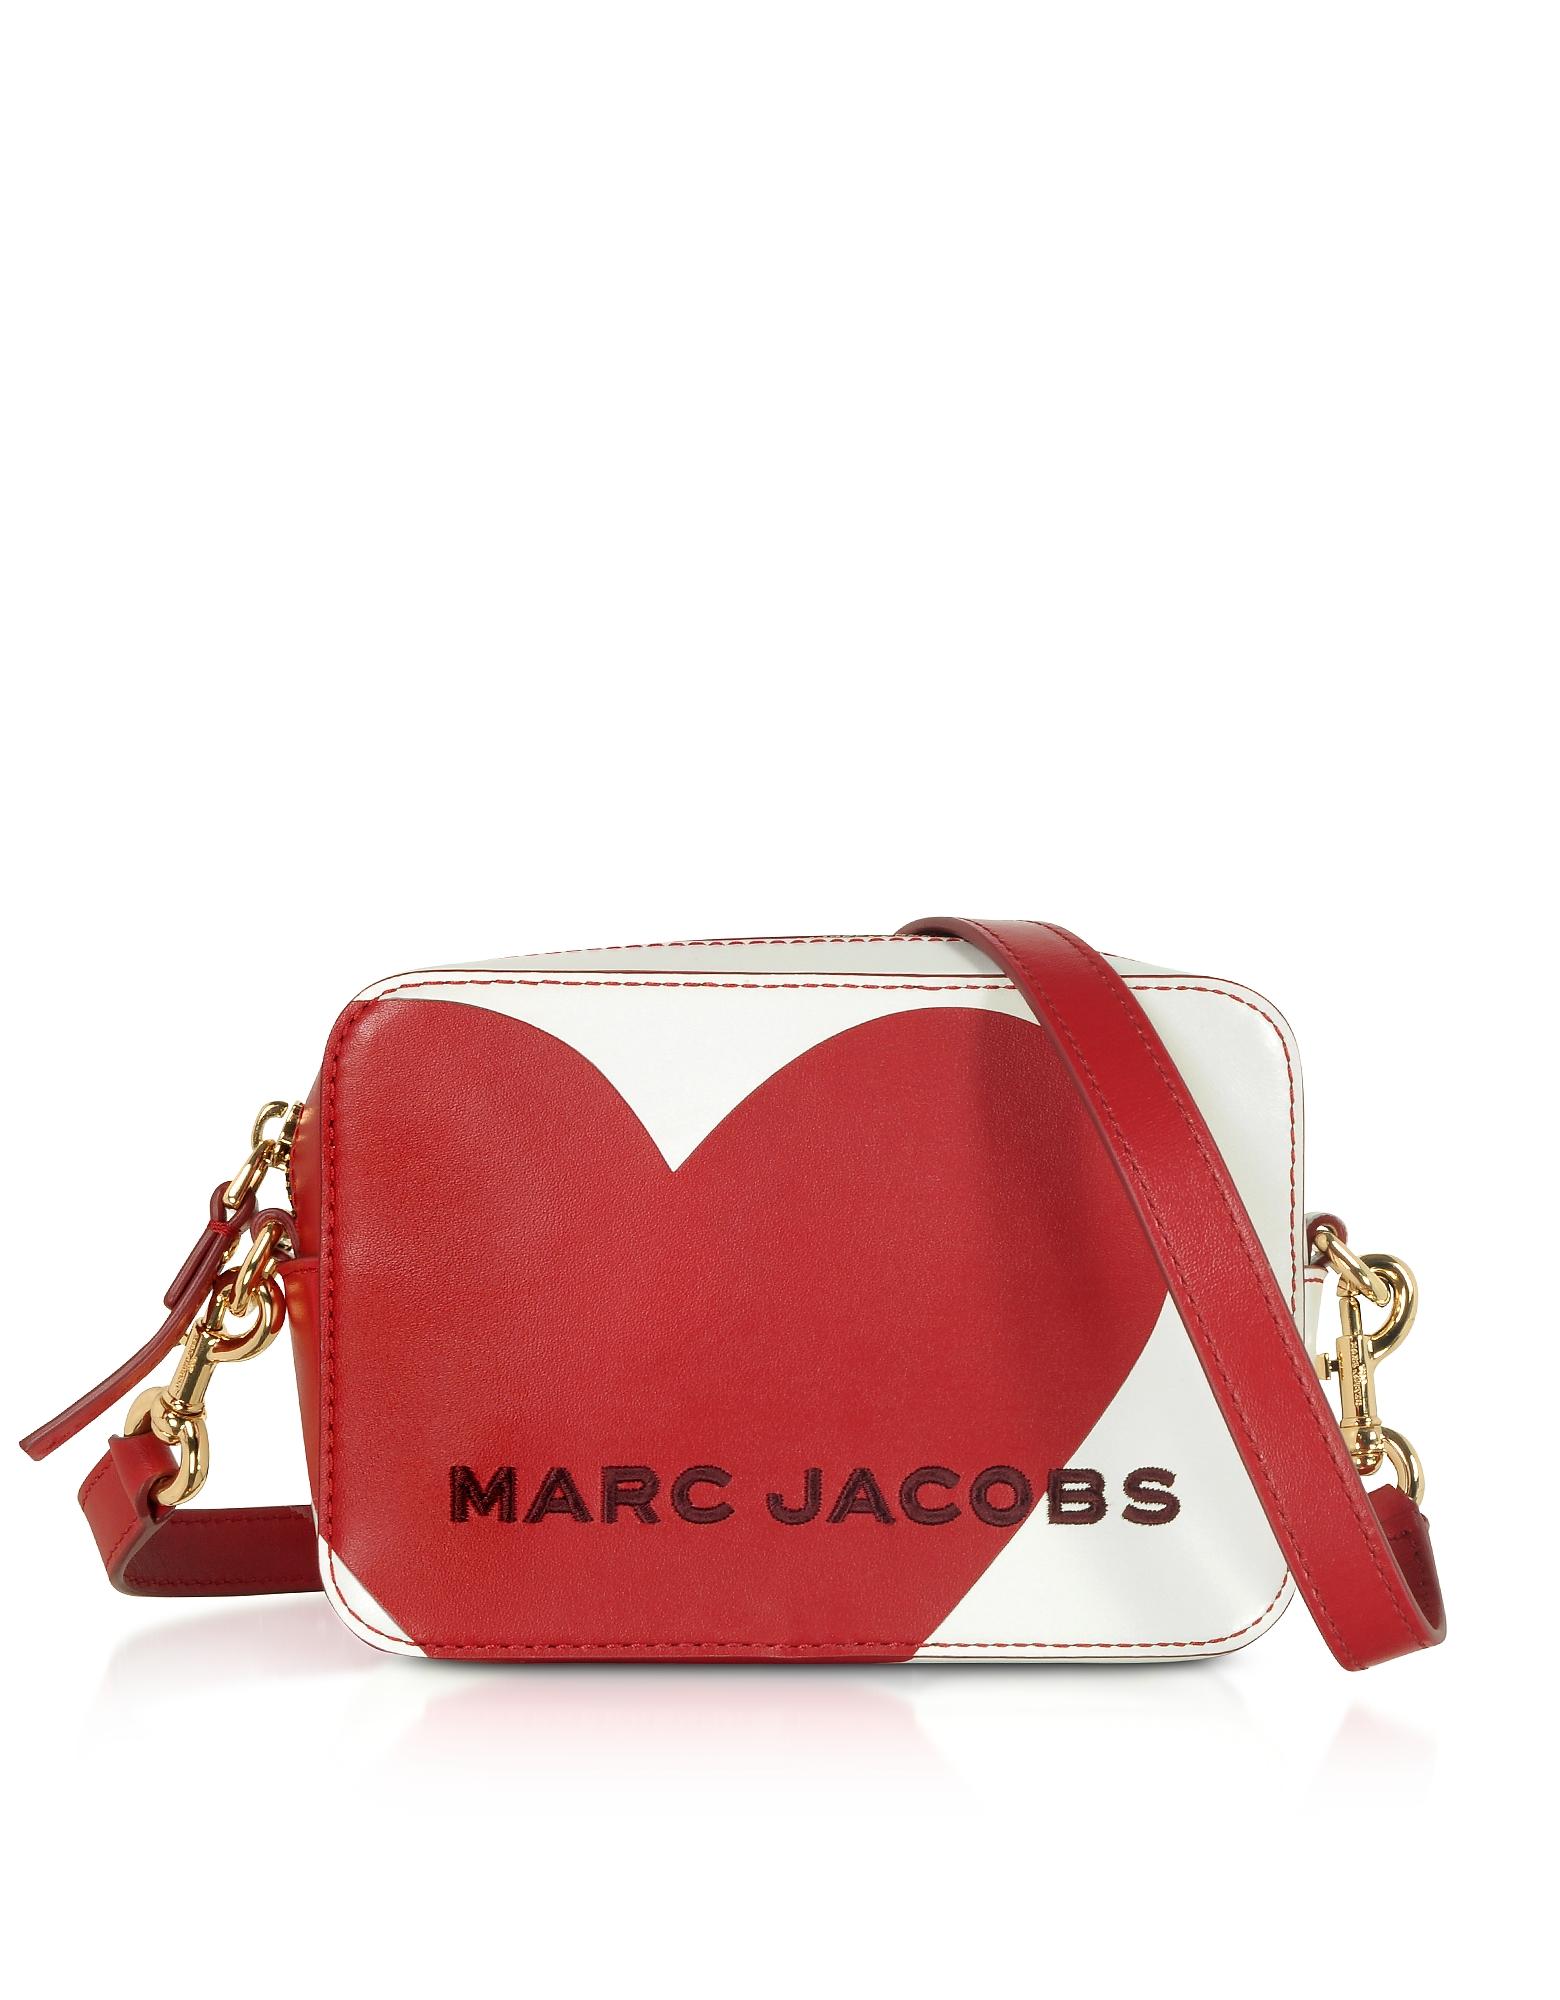 Marc Jacobs Designer Handbags, The Box Heart Intarsia Cotton Leather Crossbody Bag